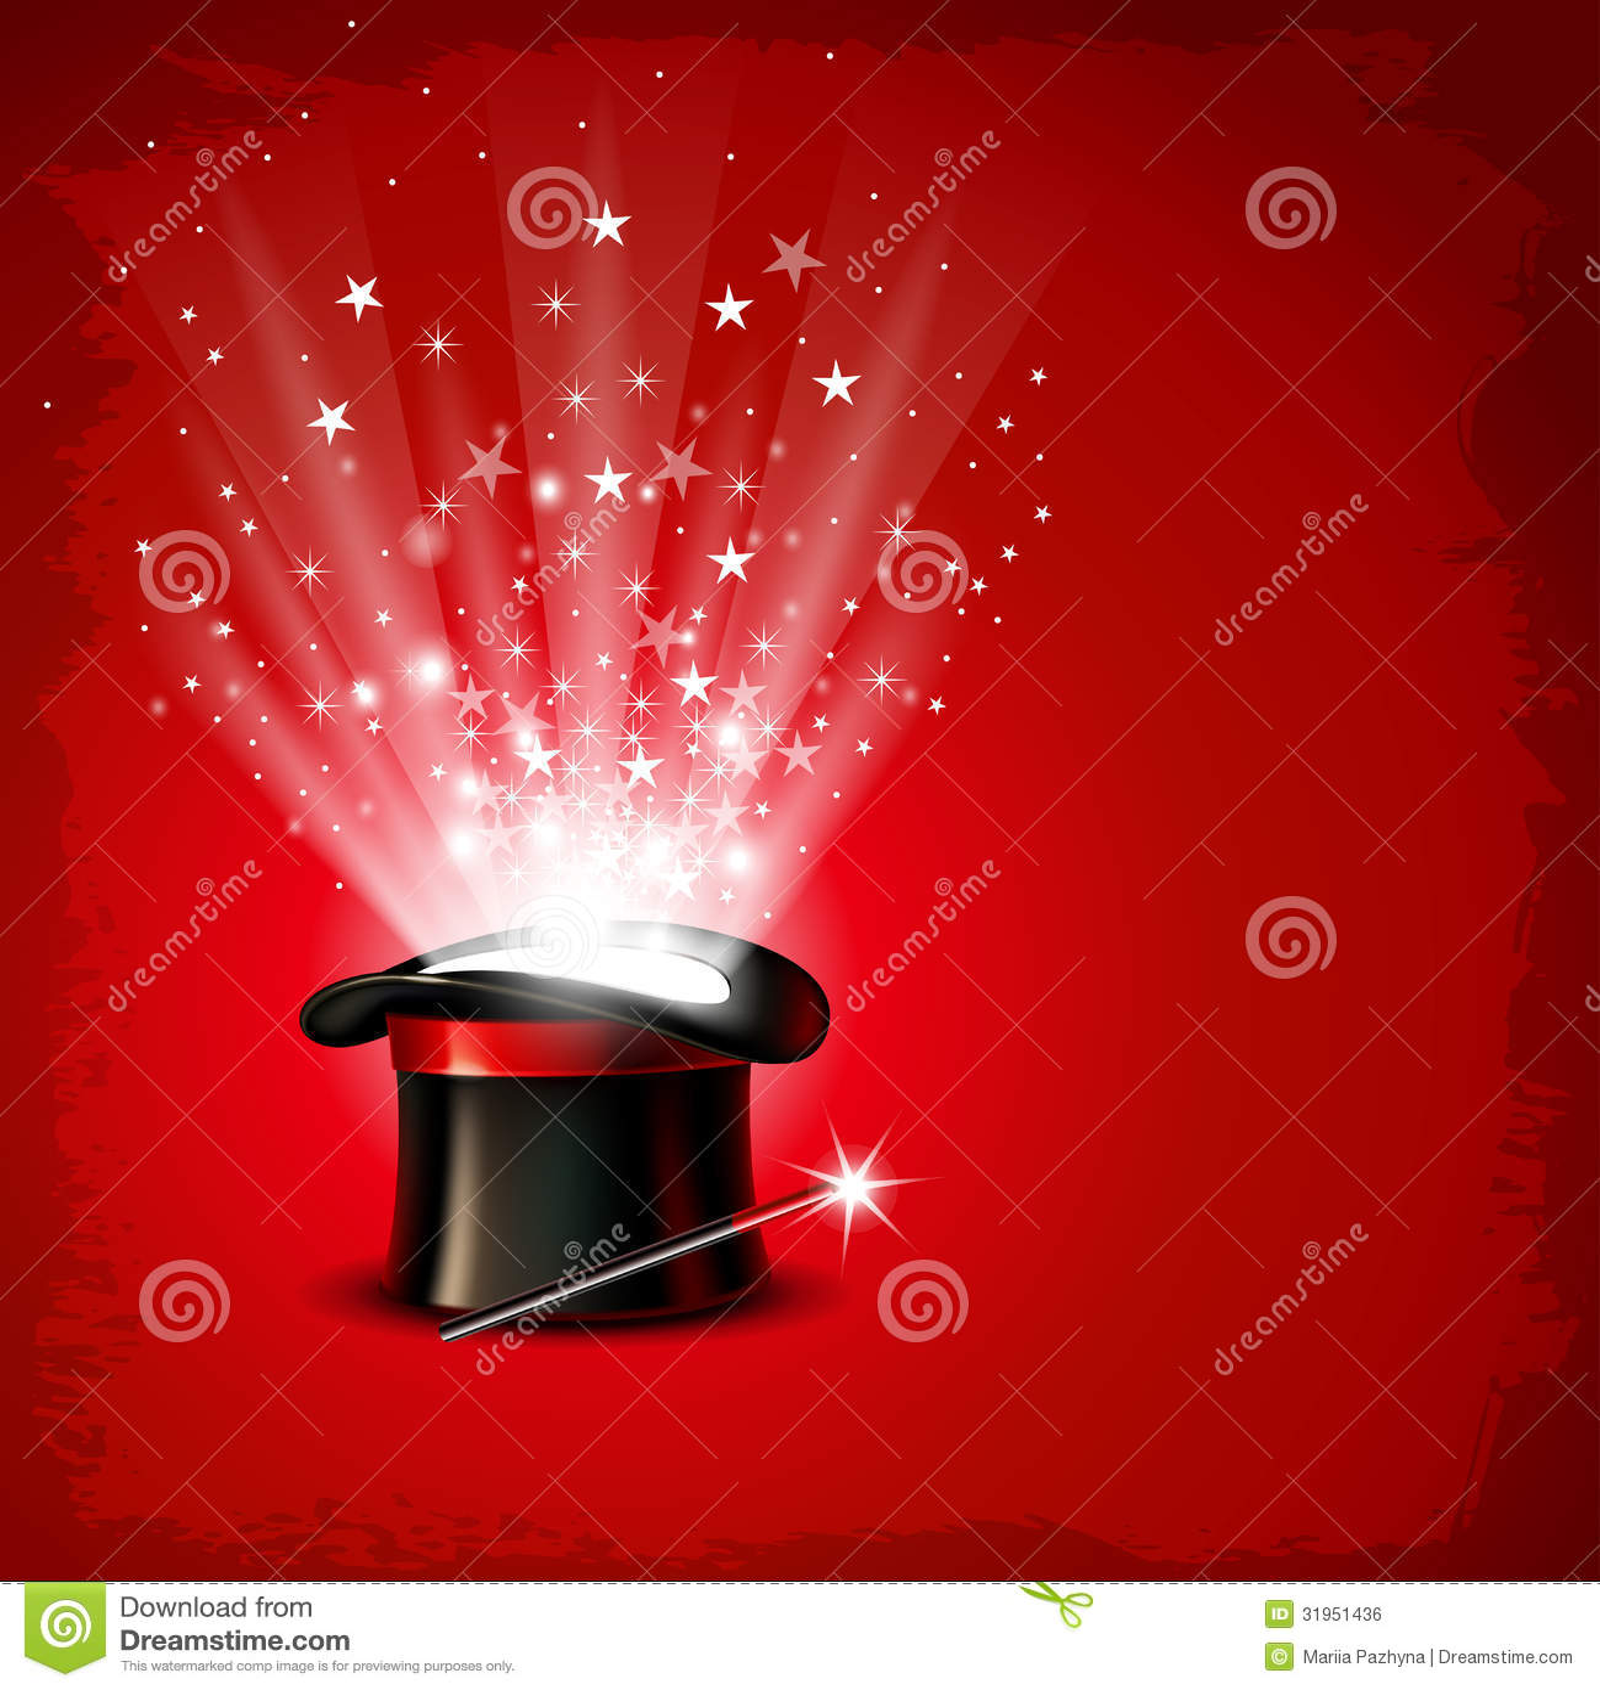 magic hat royalty free stock image image 31951436 Magic Wand Clip Art Magic Hat Background